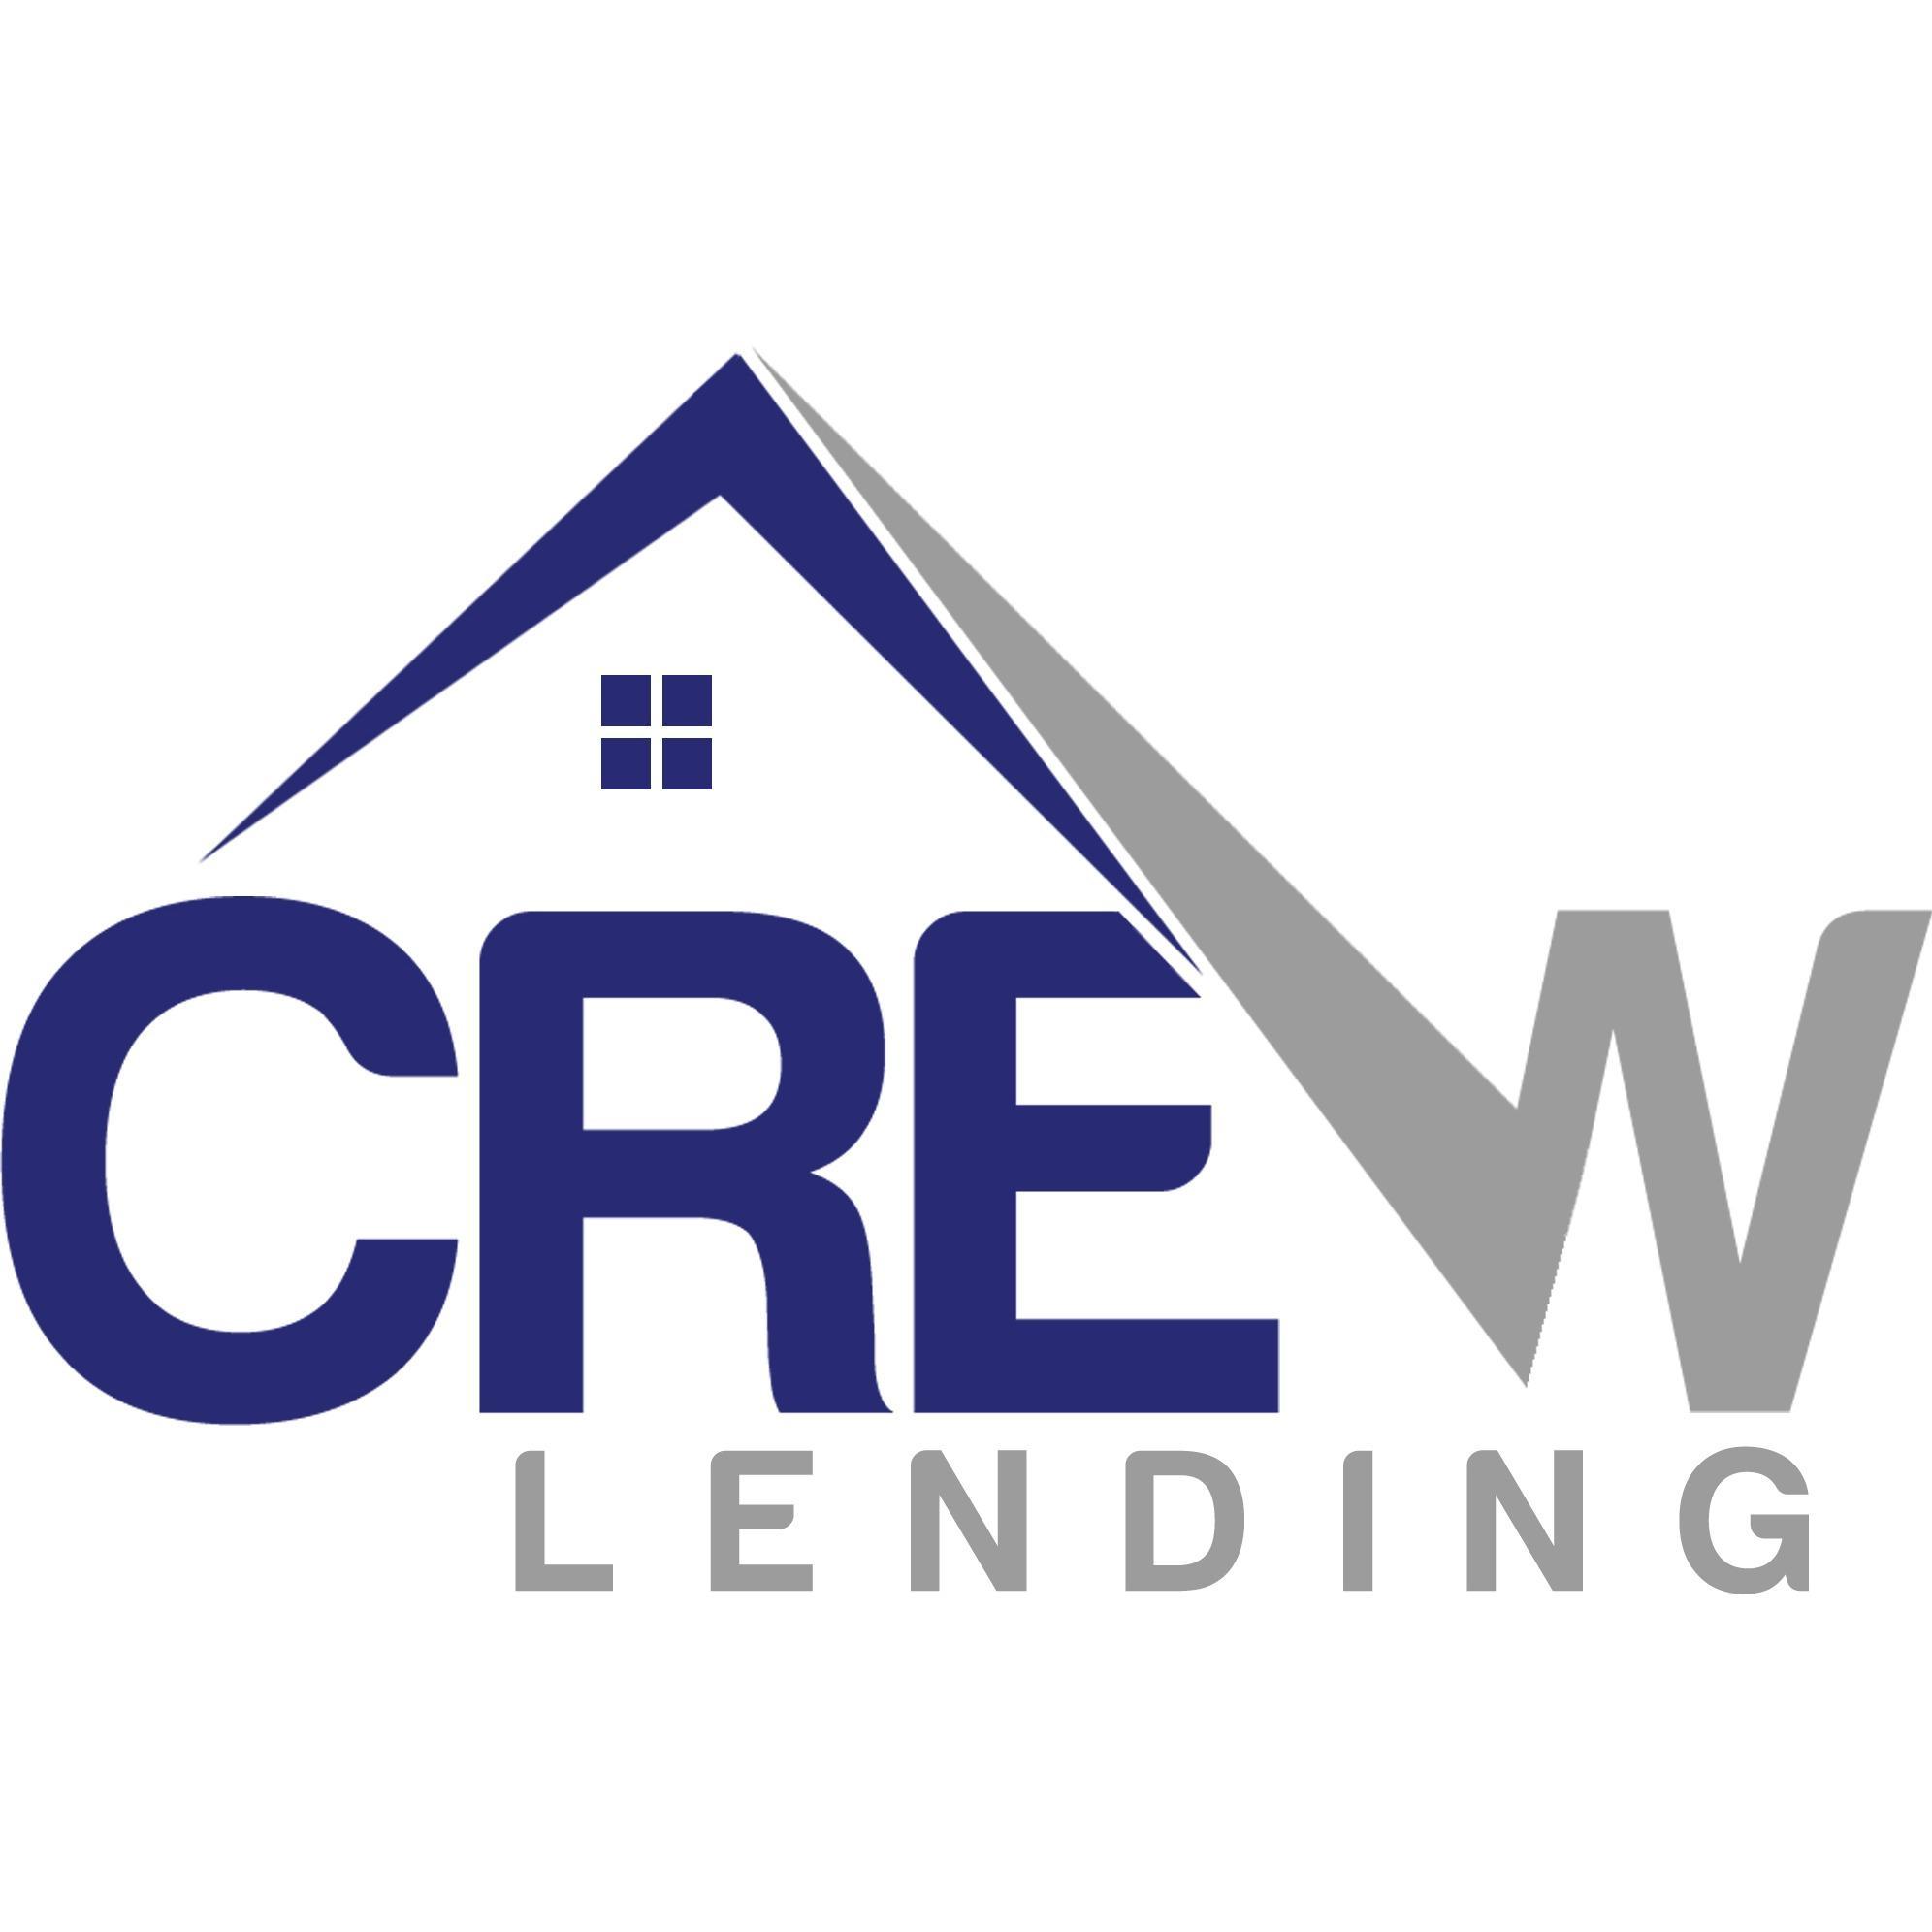 Kara Davis - Crew Lending